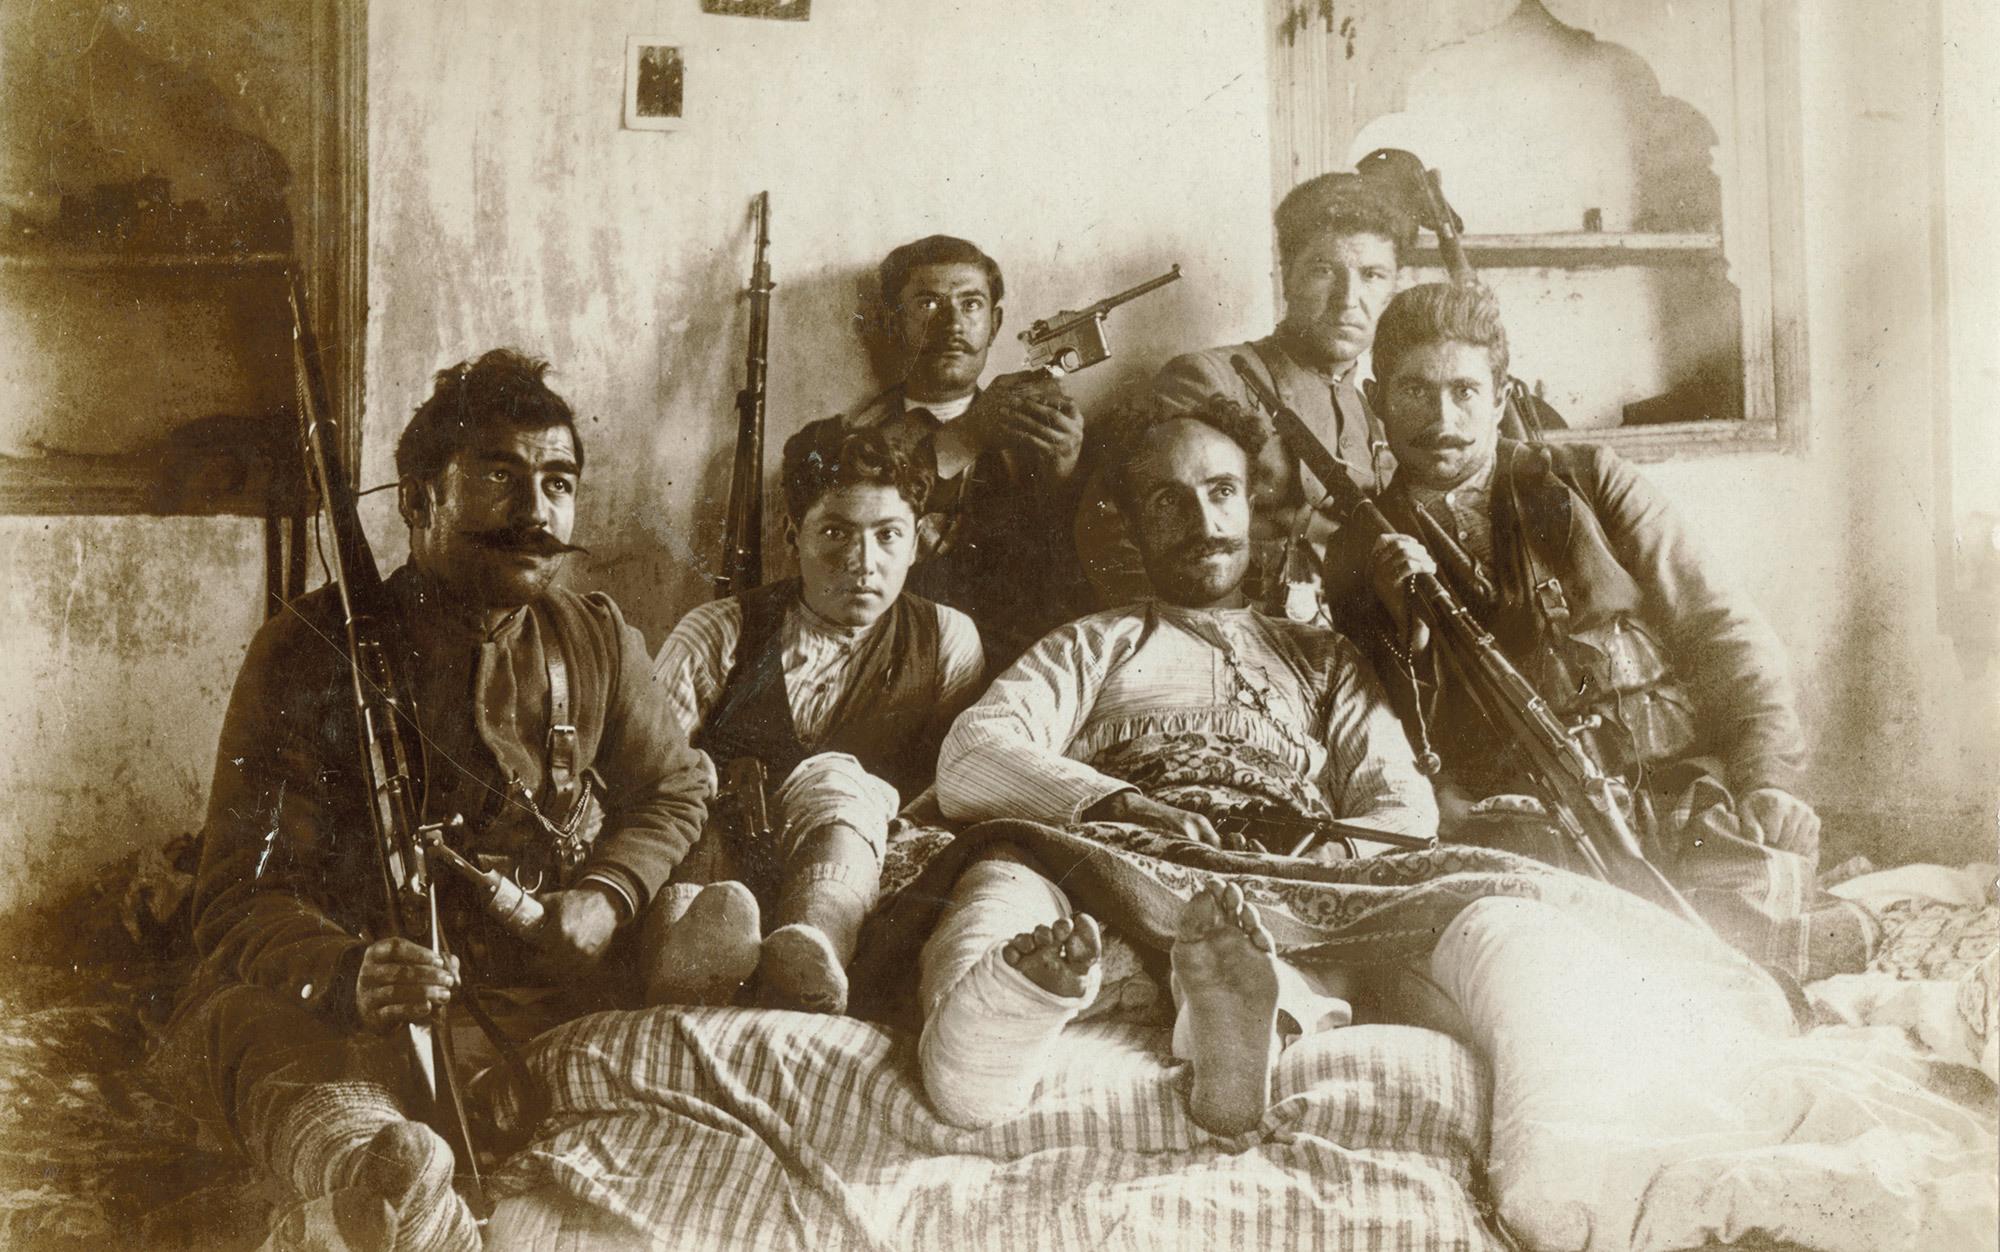 How cosmopolitan Armenian radicals launched the 20th century – Houri Berberian | Aeon Essays